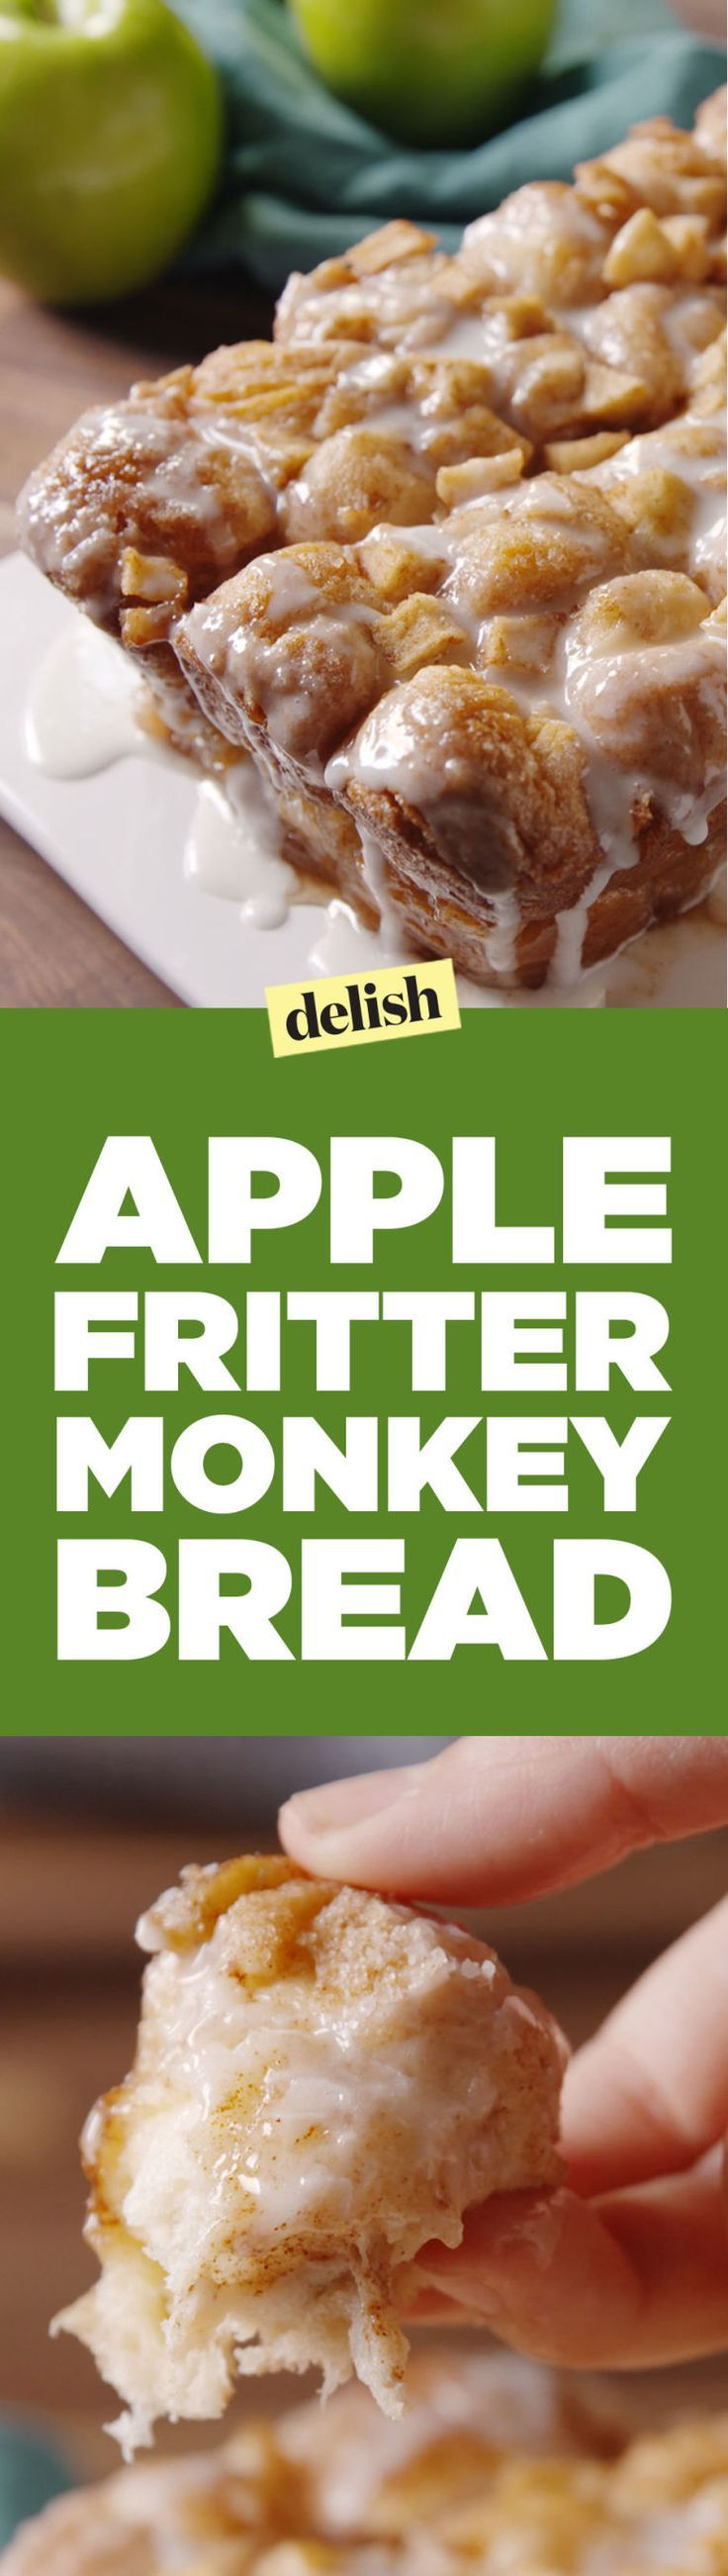 Apple Fritter Monkey Bread  - http://Delish.com                                                                                                                                                                                 More